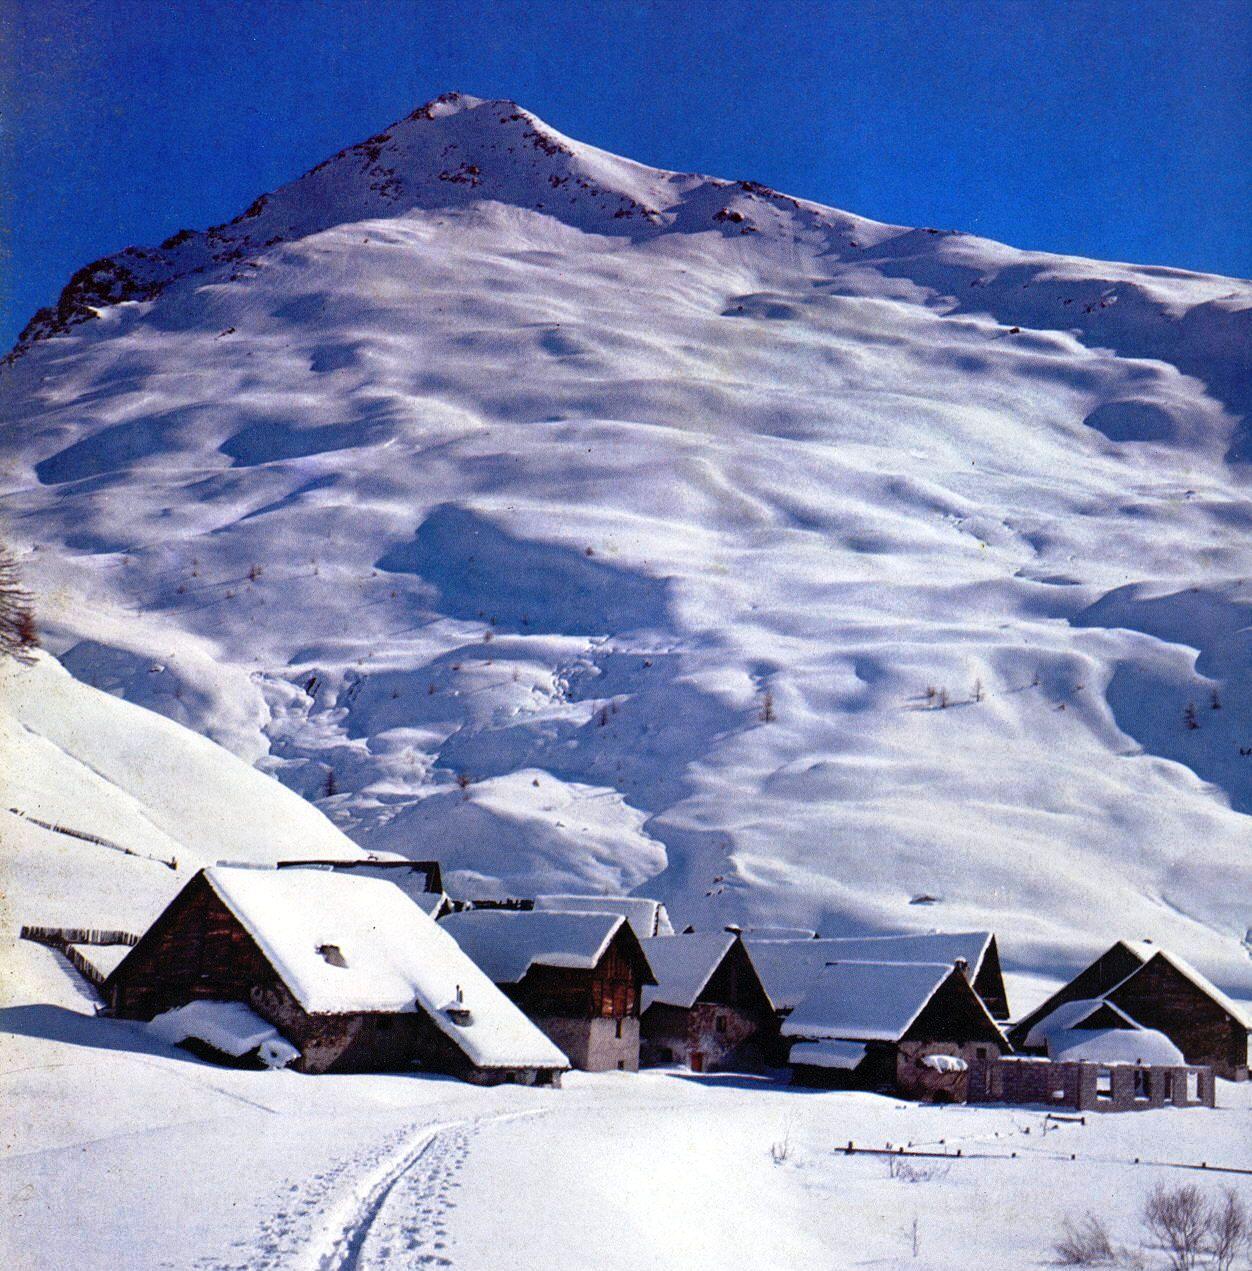 La neige en montagne ... X9f22qt9